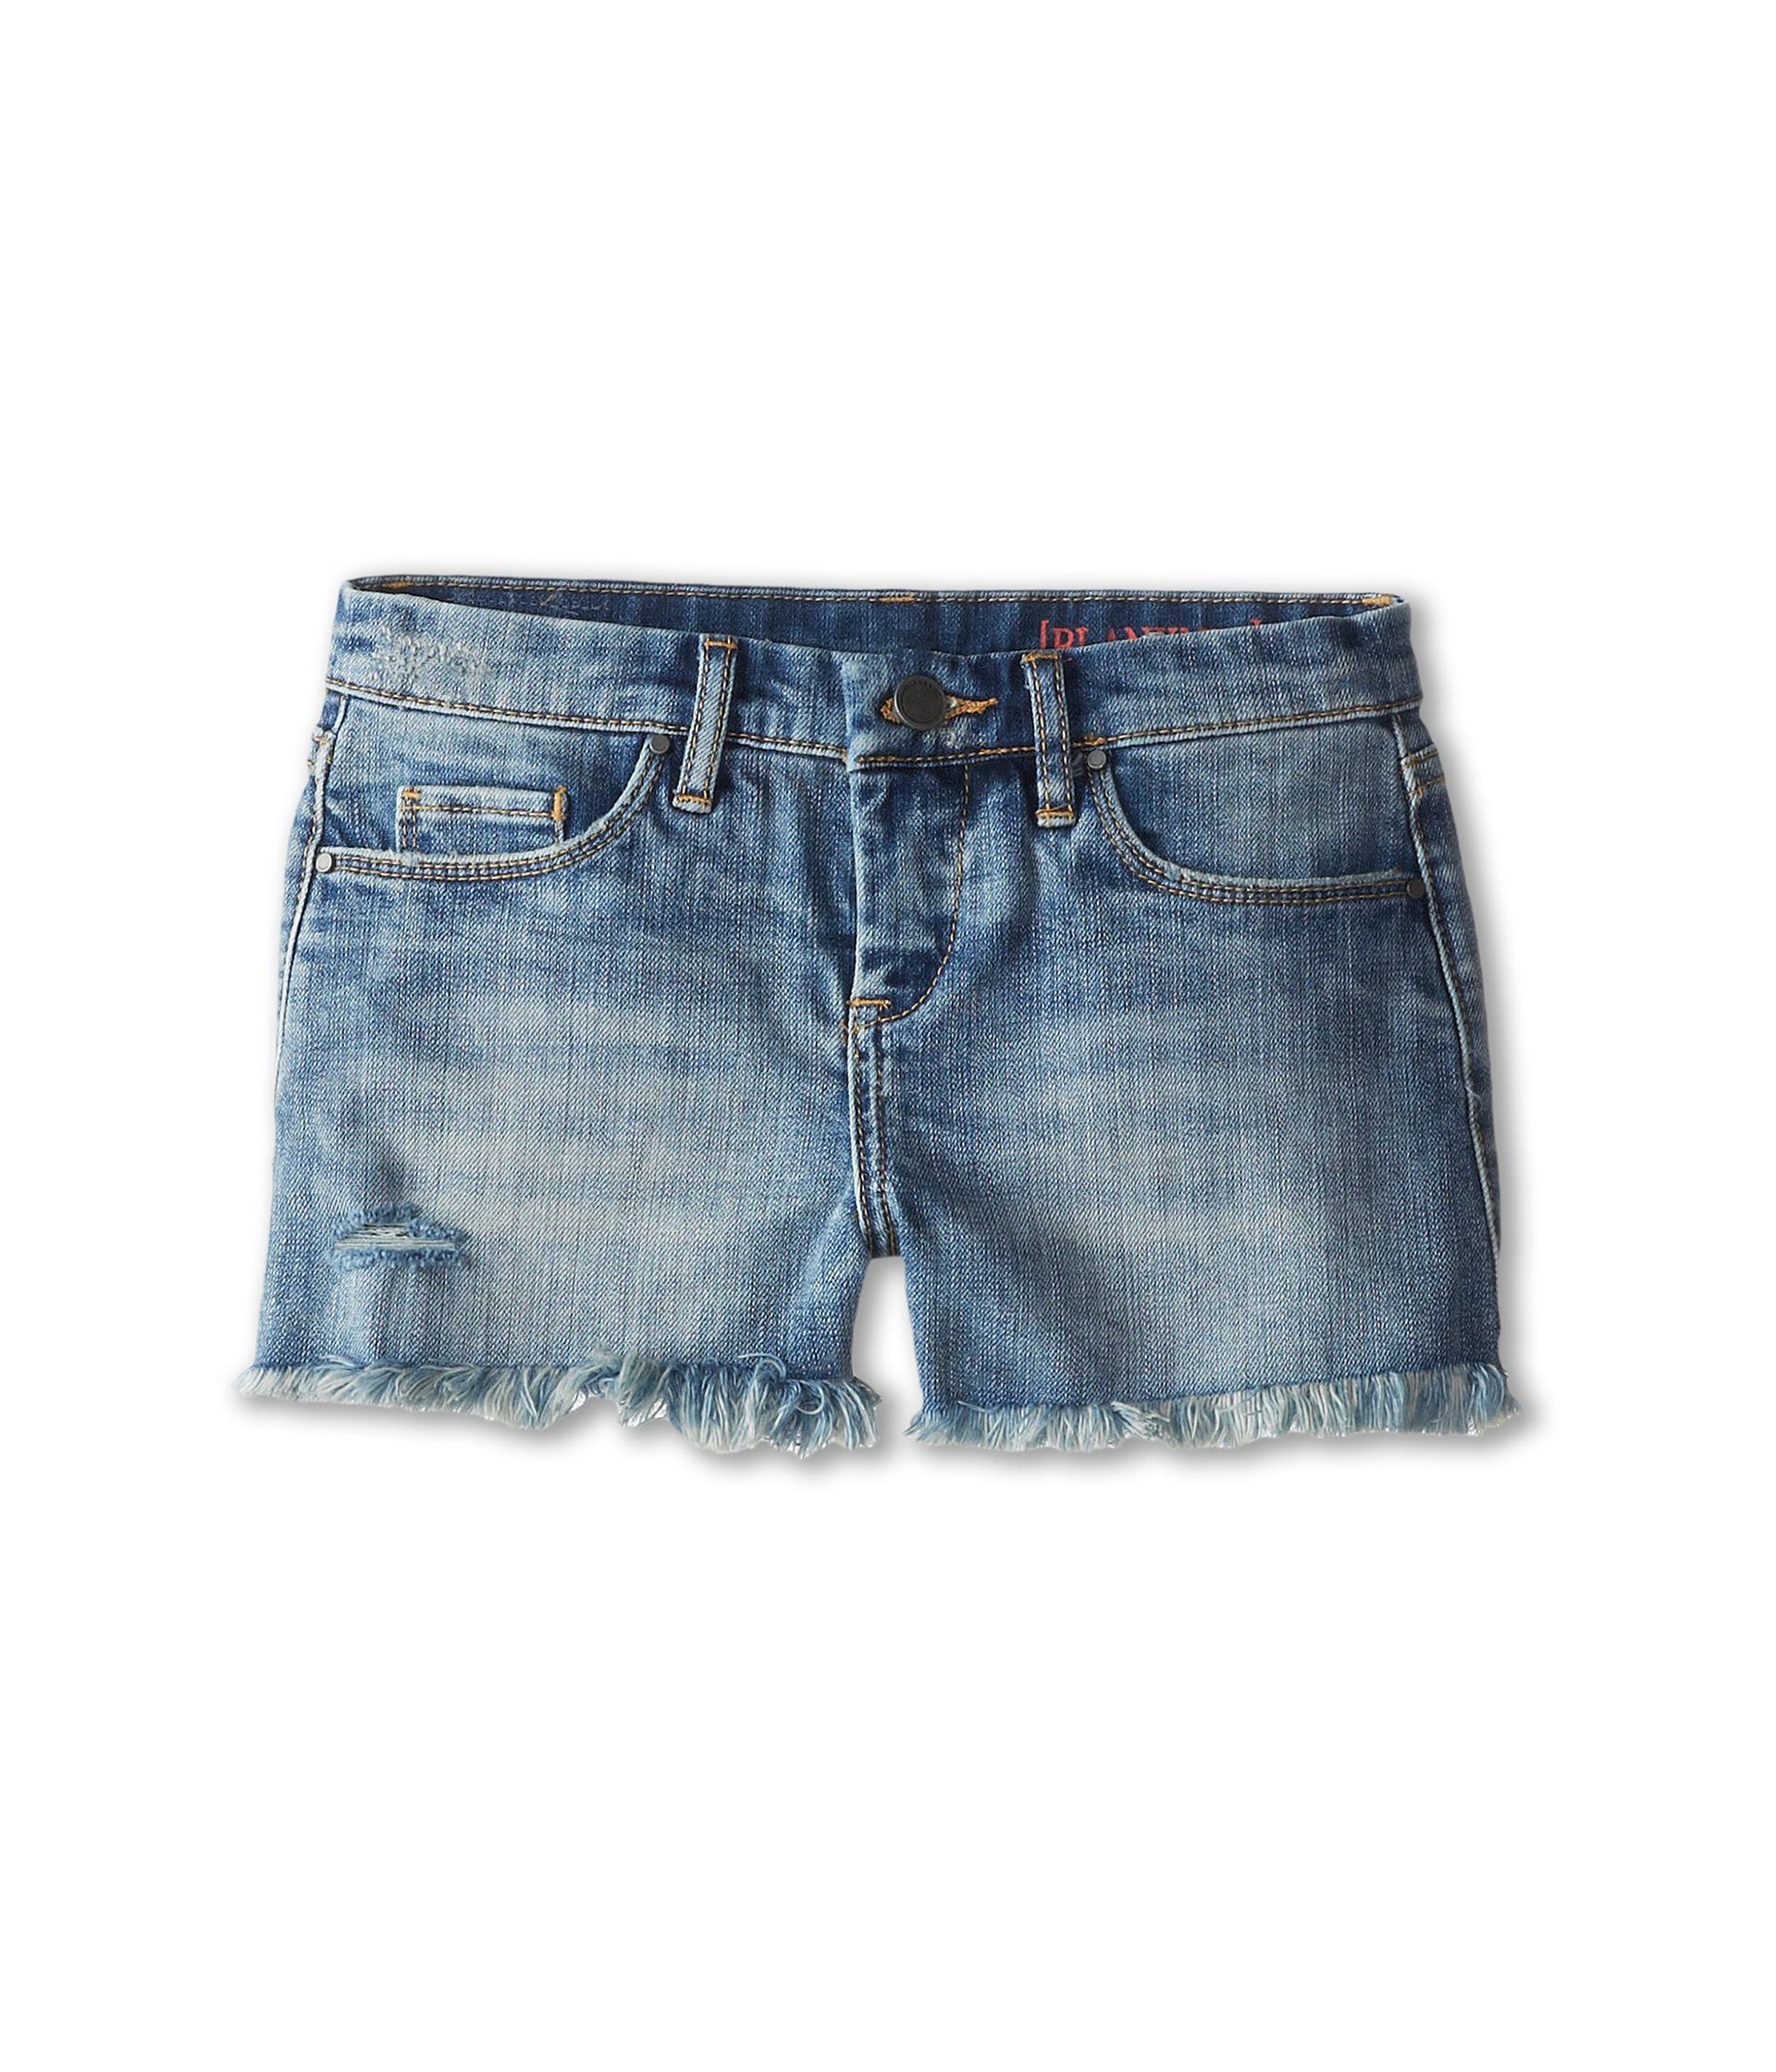 Blank NYC Kids Medium Denim Cut Off Shorts in Flavor Savor (Big Kids) at Zappos.com